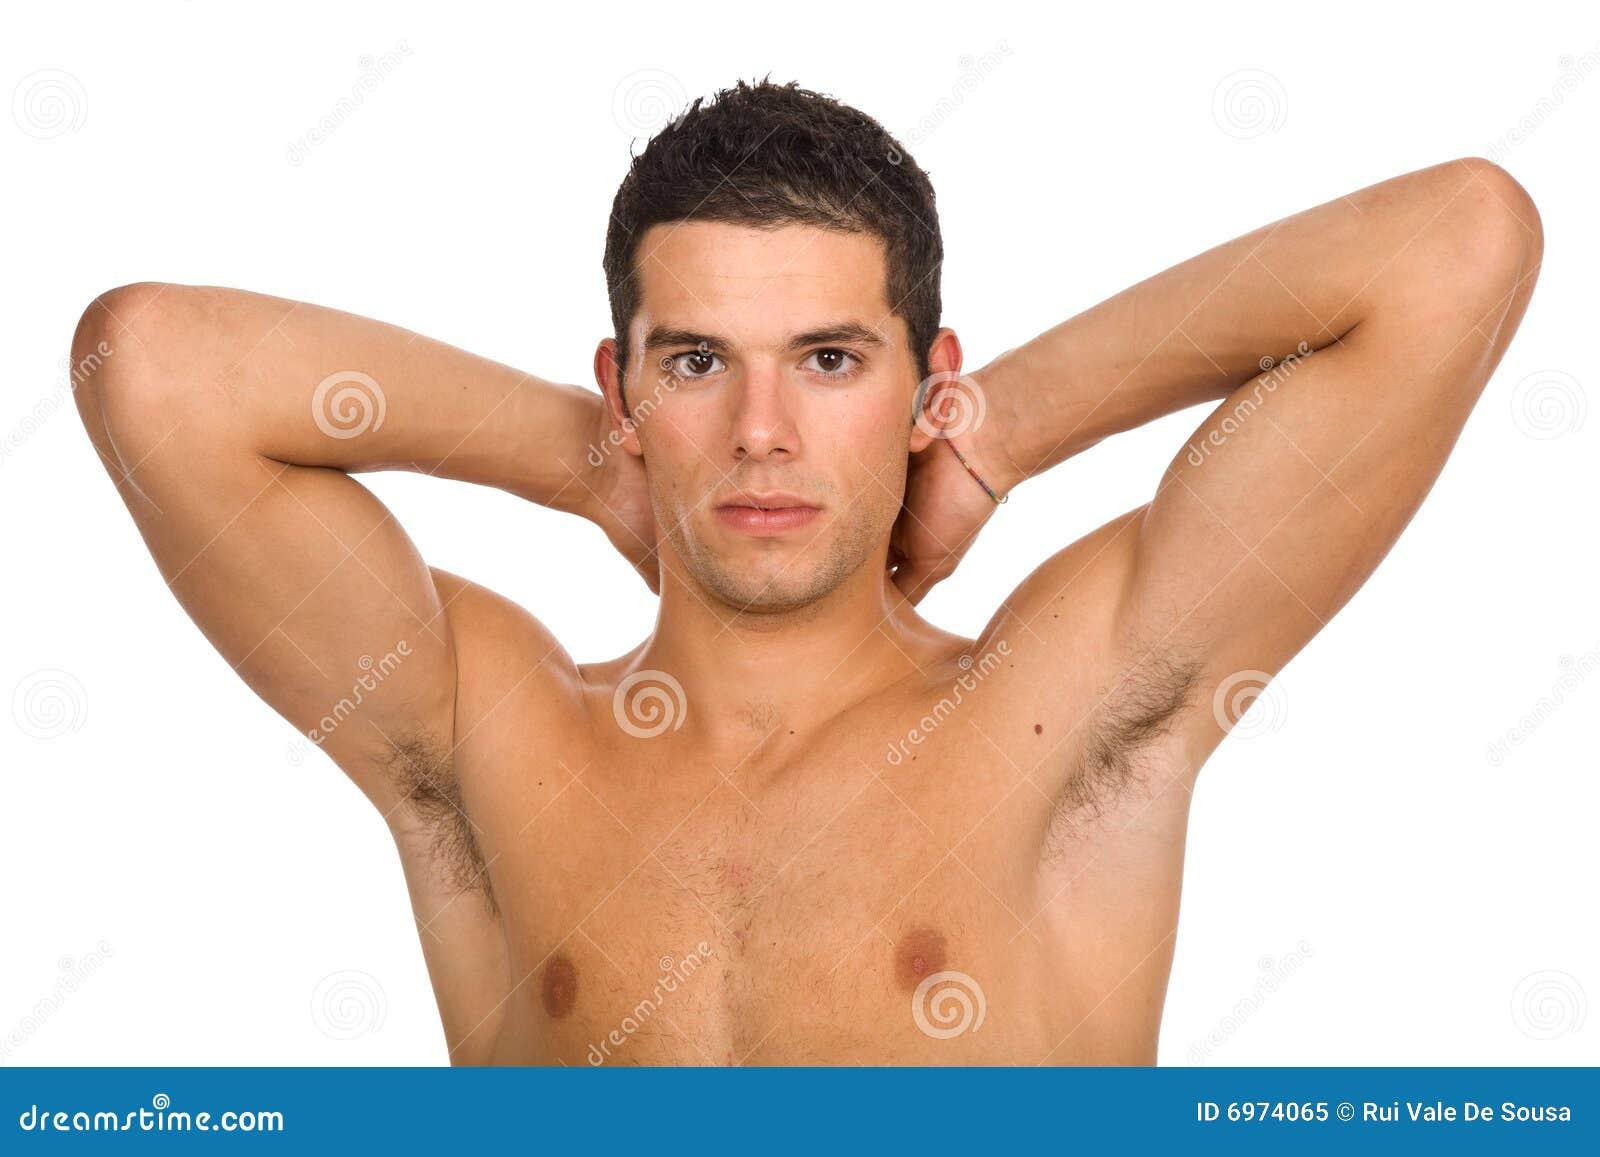 Stories young men spank mature women